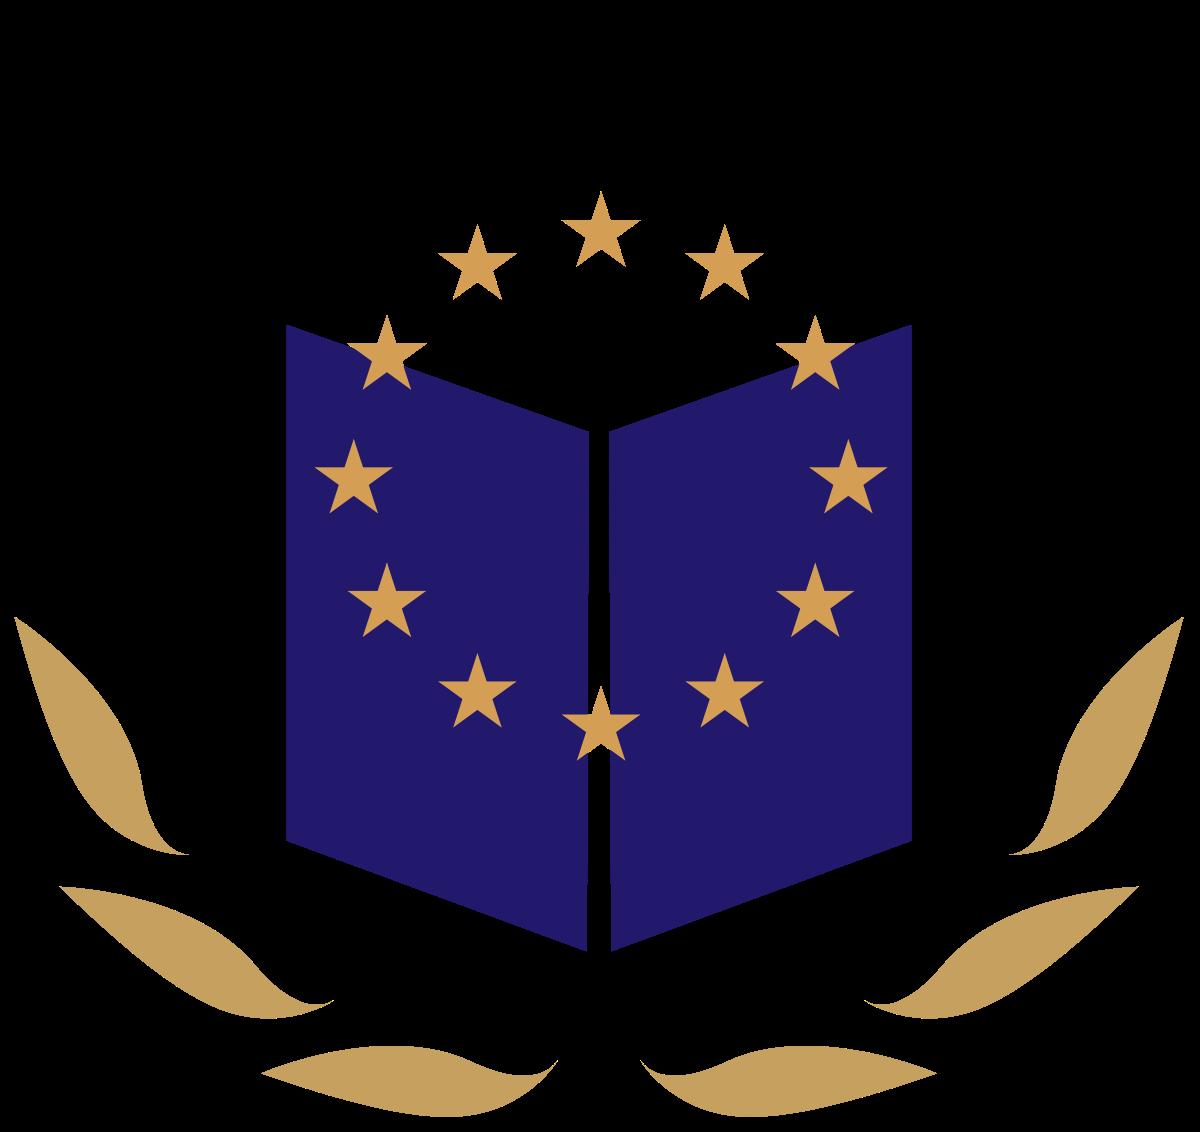 Court state union address